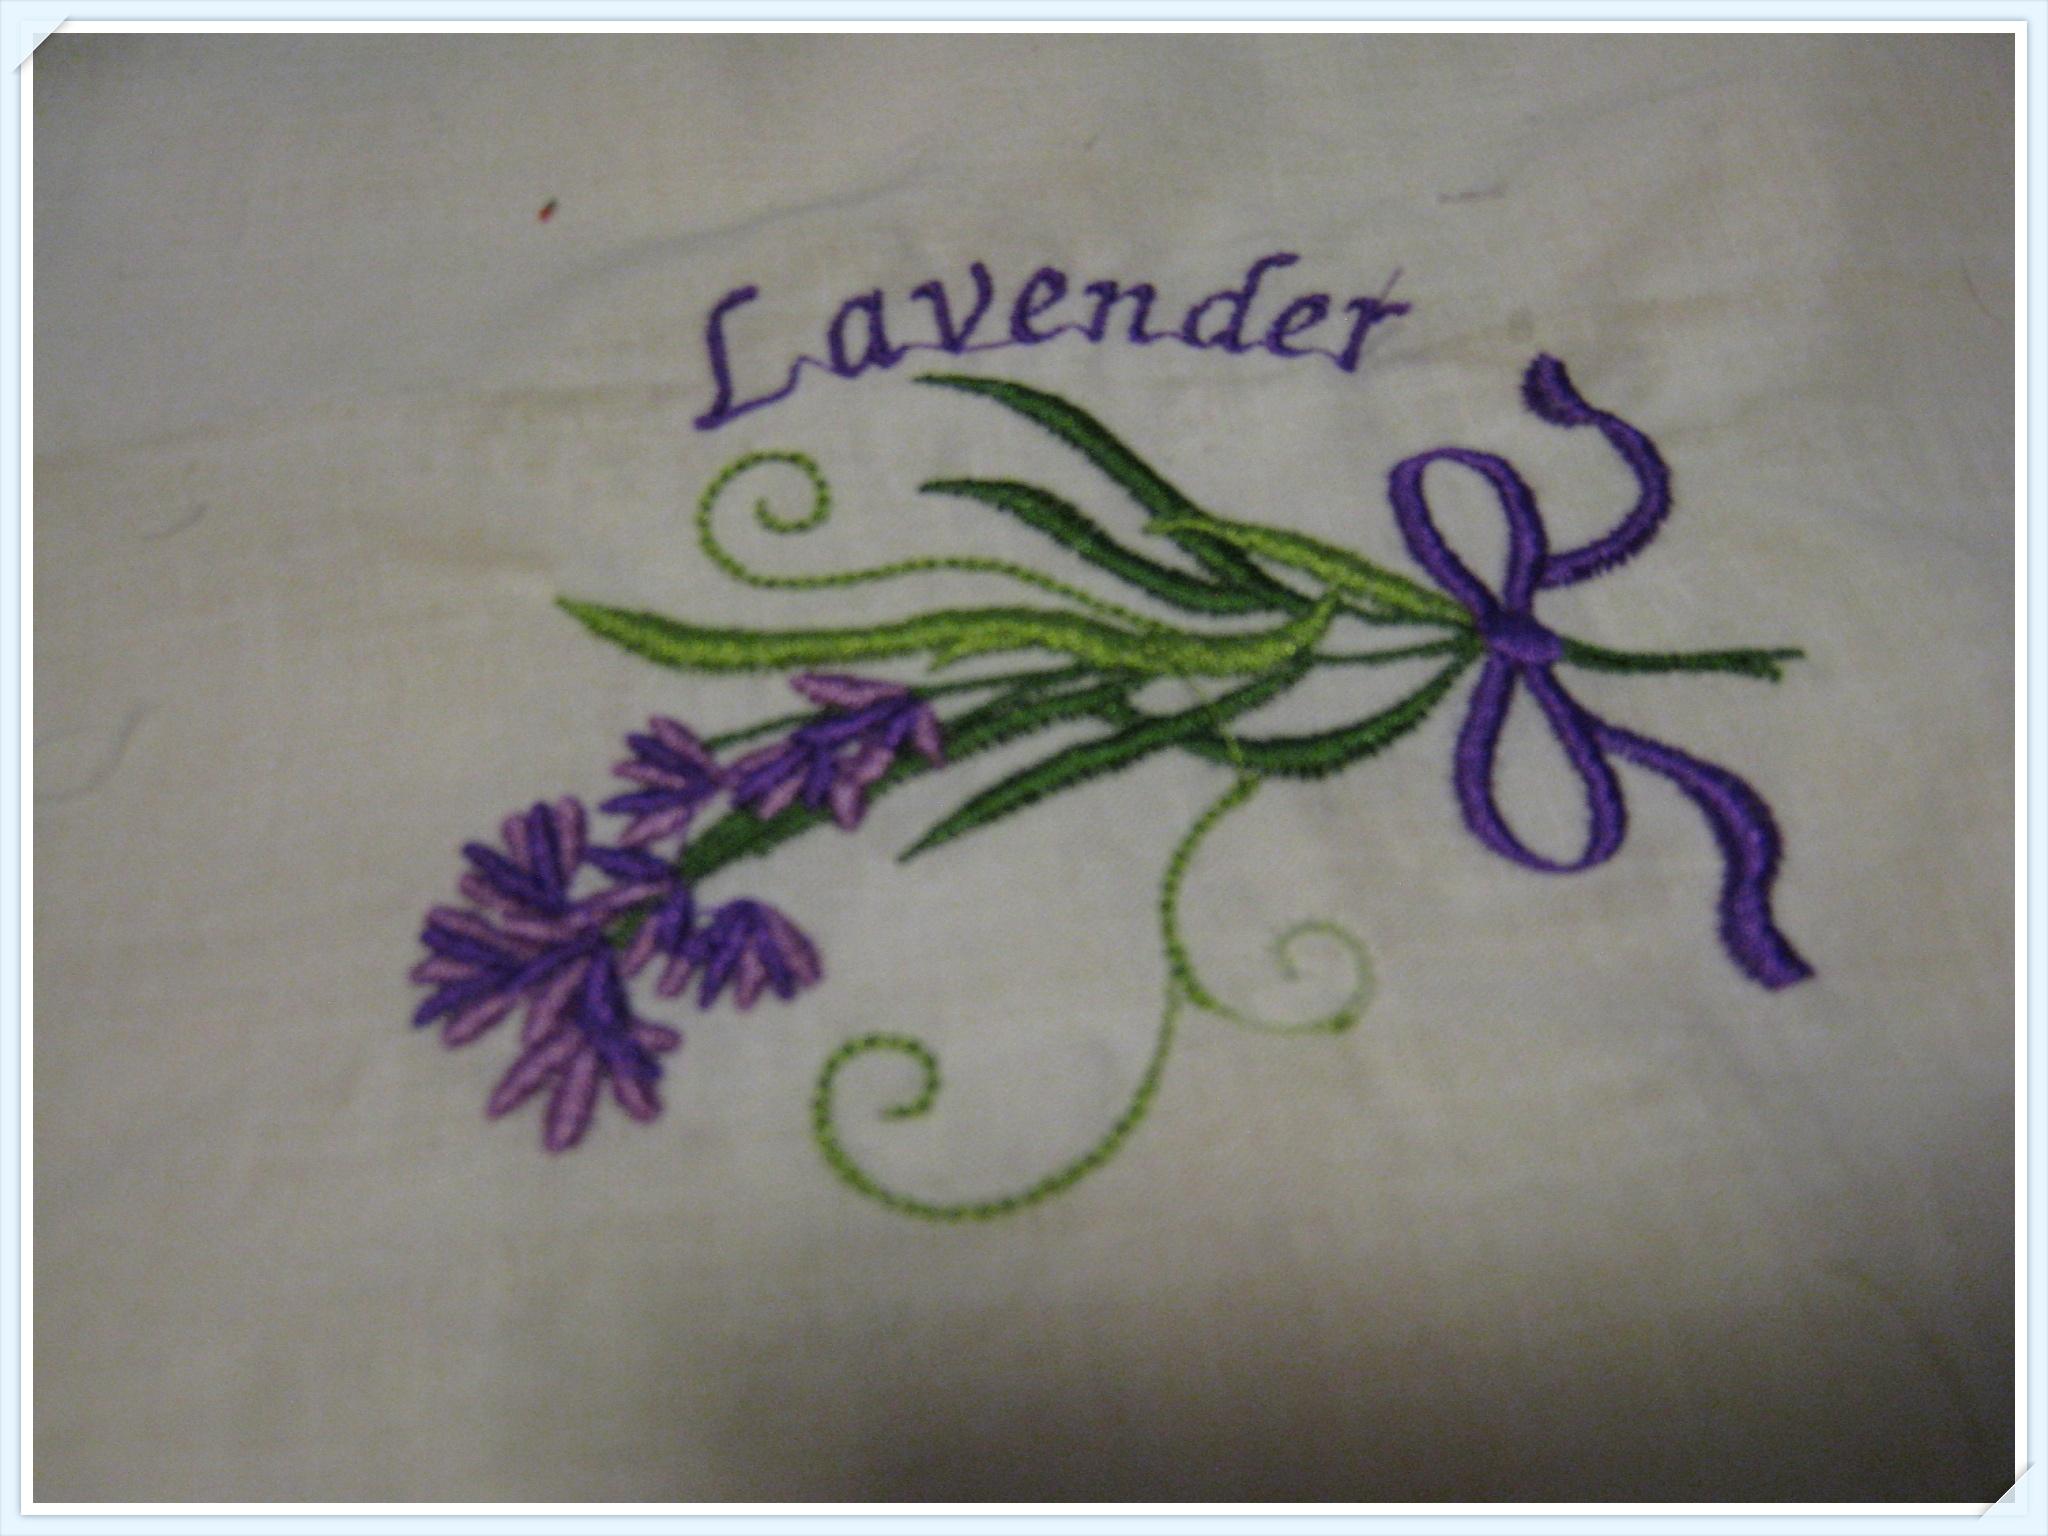 lavender_embro_808.jpg